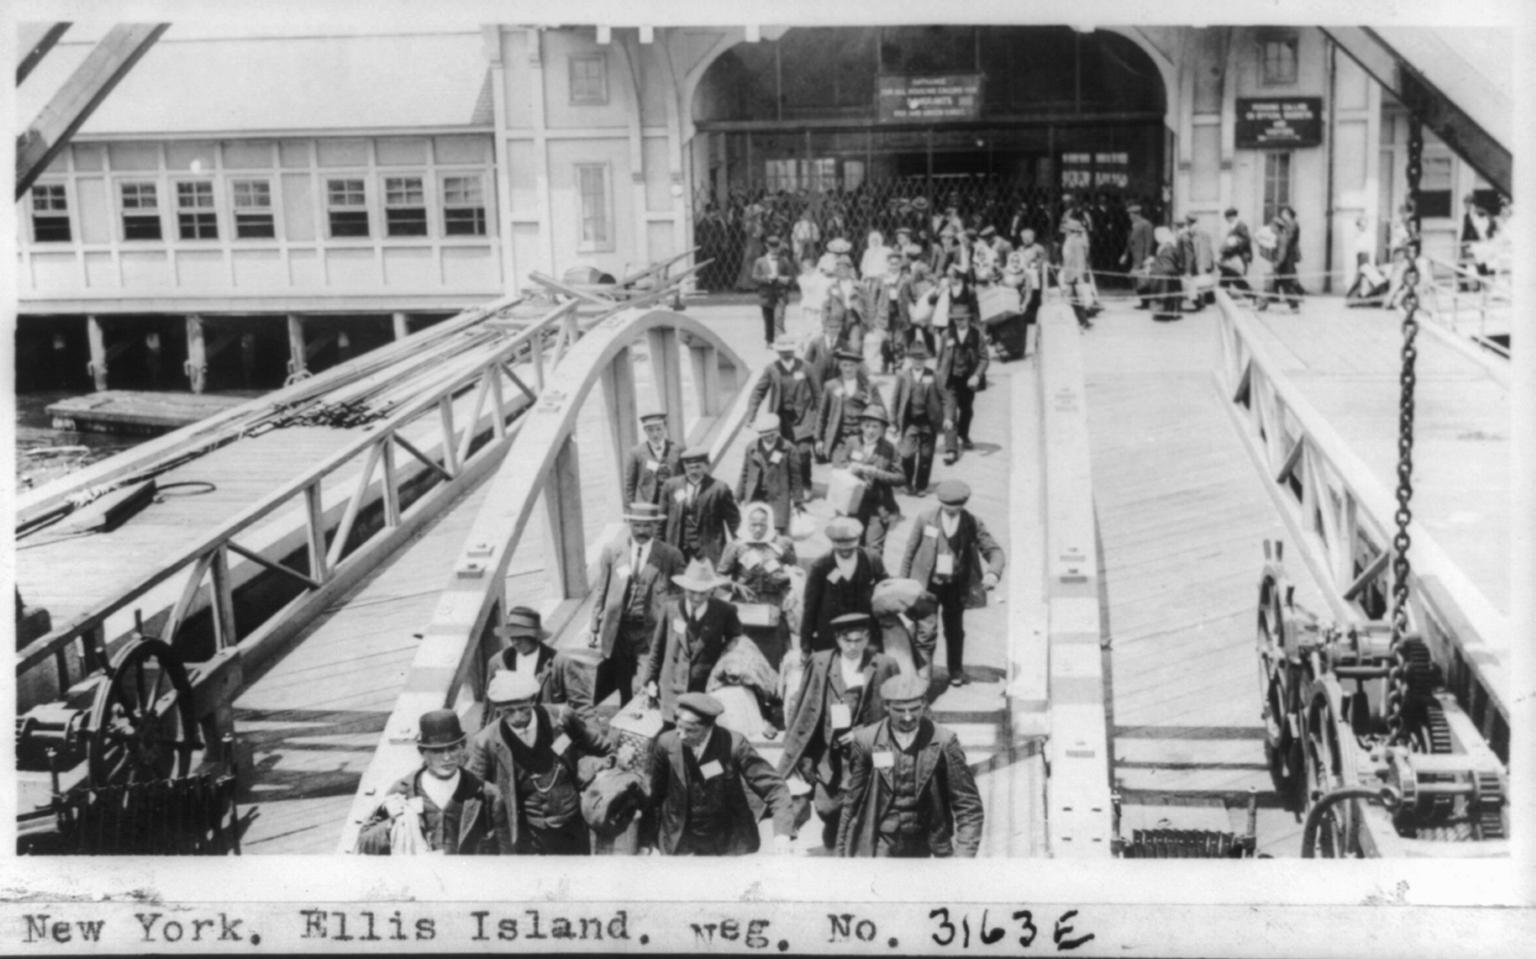 Ellis Island Immigrants by National Photo Co., ca. 1909-1932